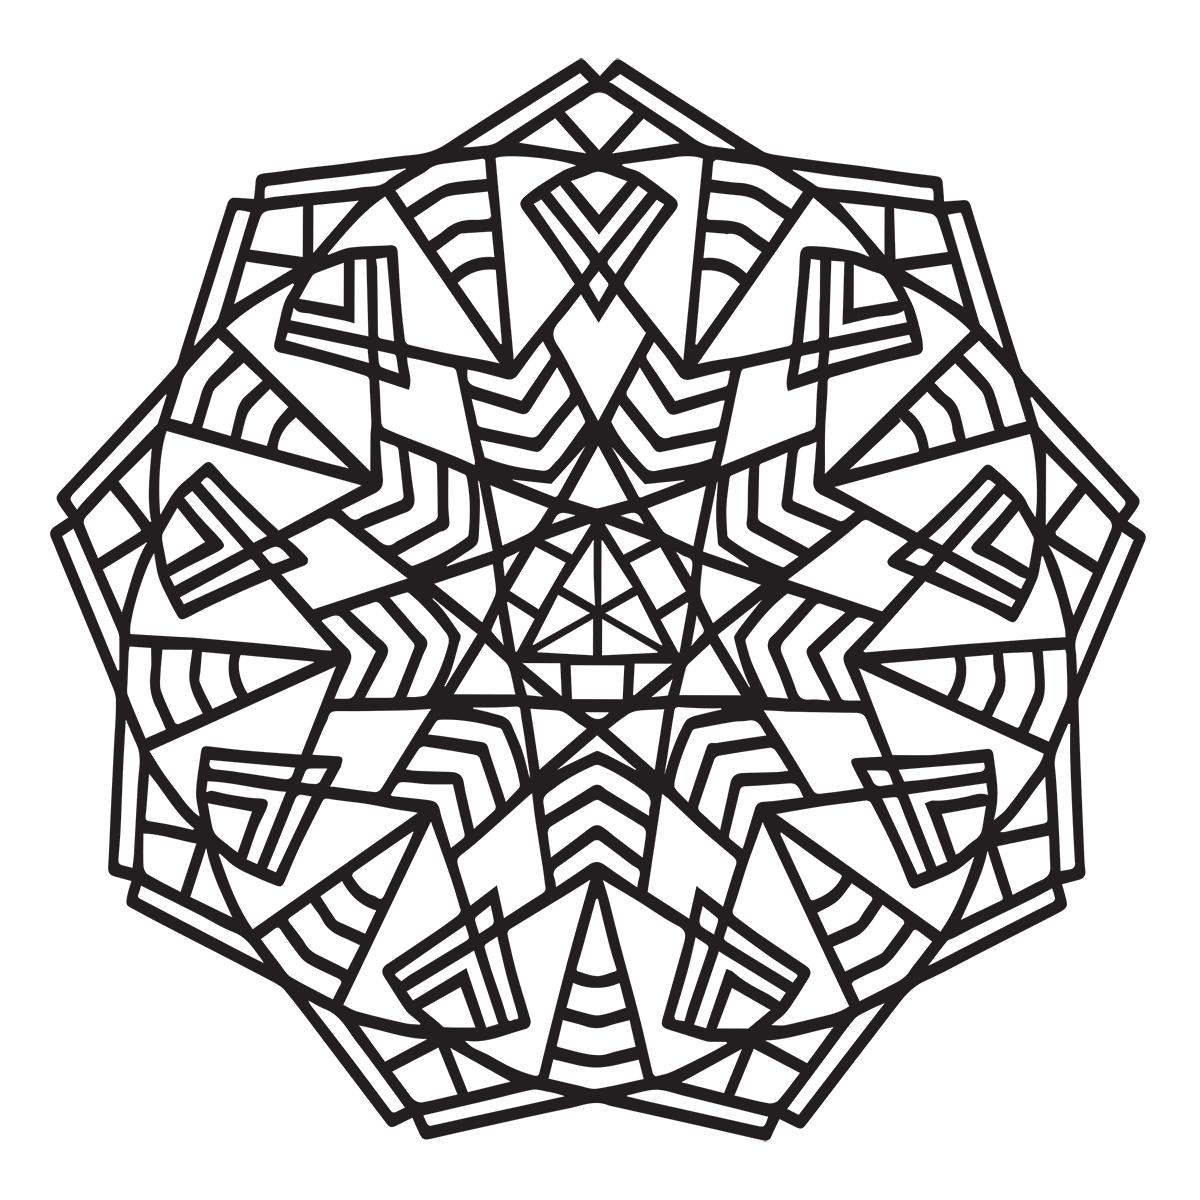 Geometric Mandala Coloring Page - Babadoodle